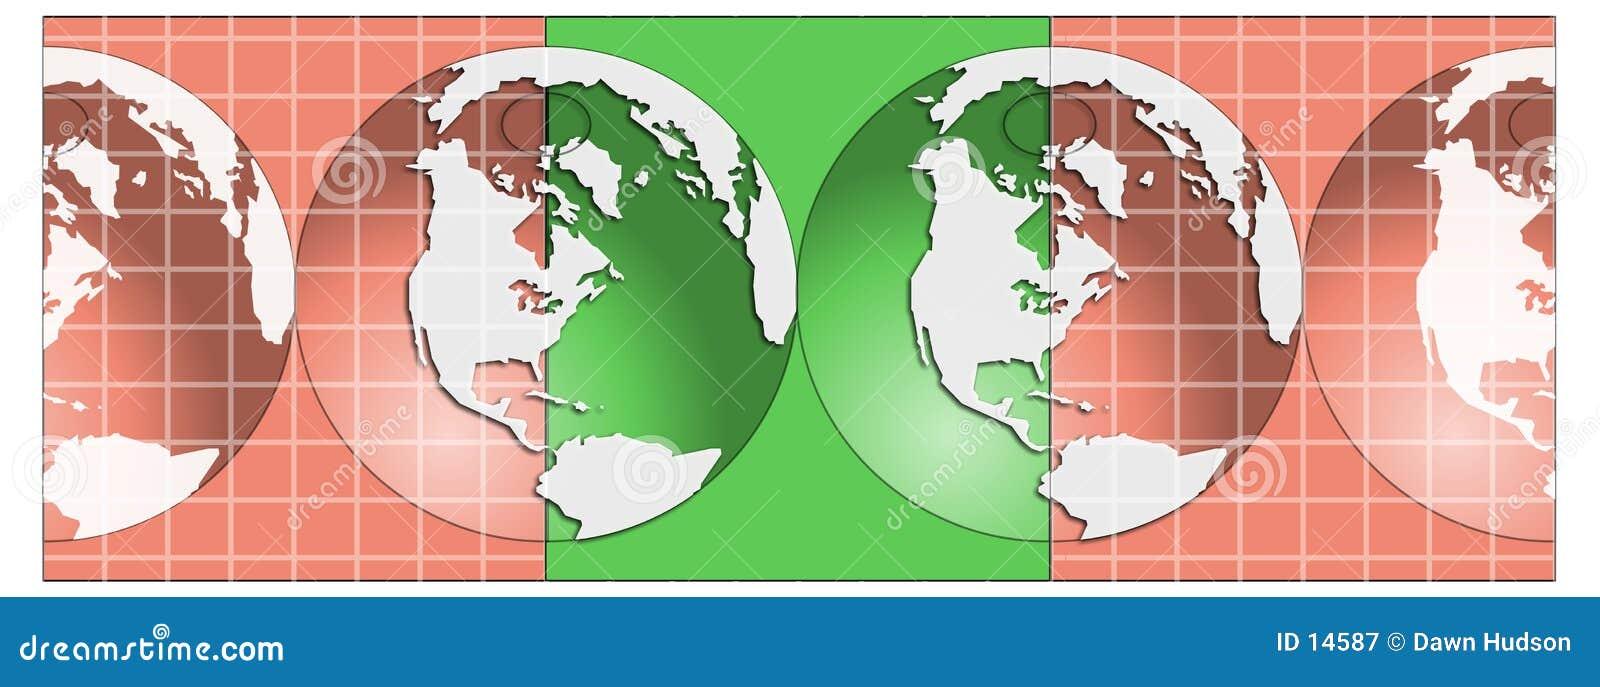 Globusy ilustracyjne